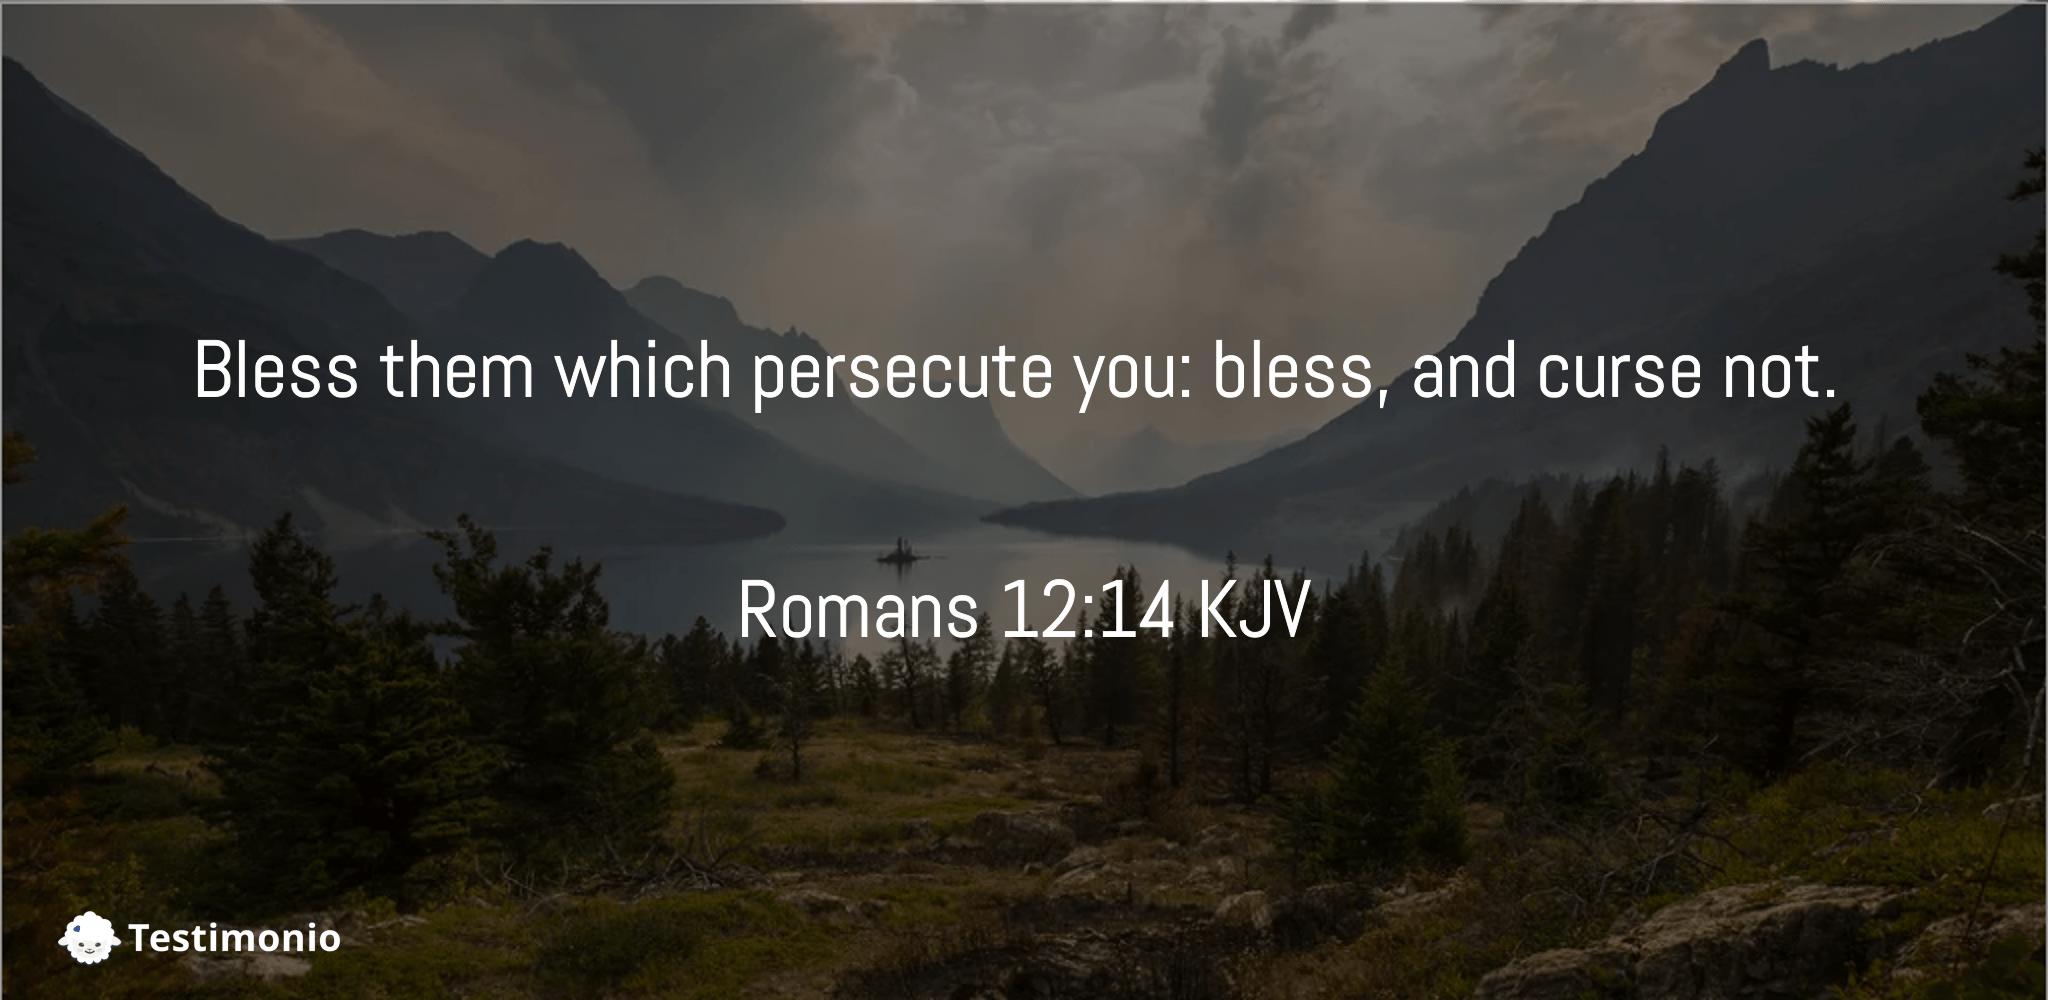 Romans 12:14